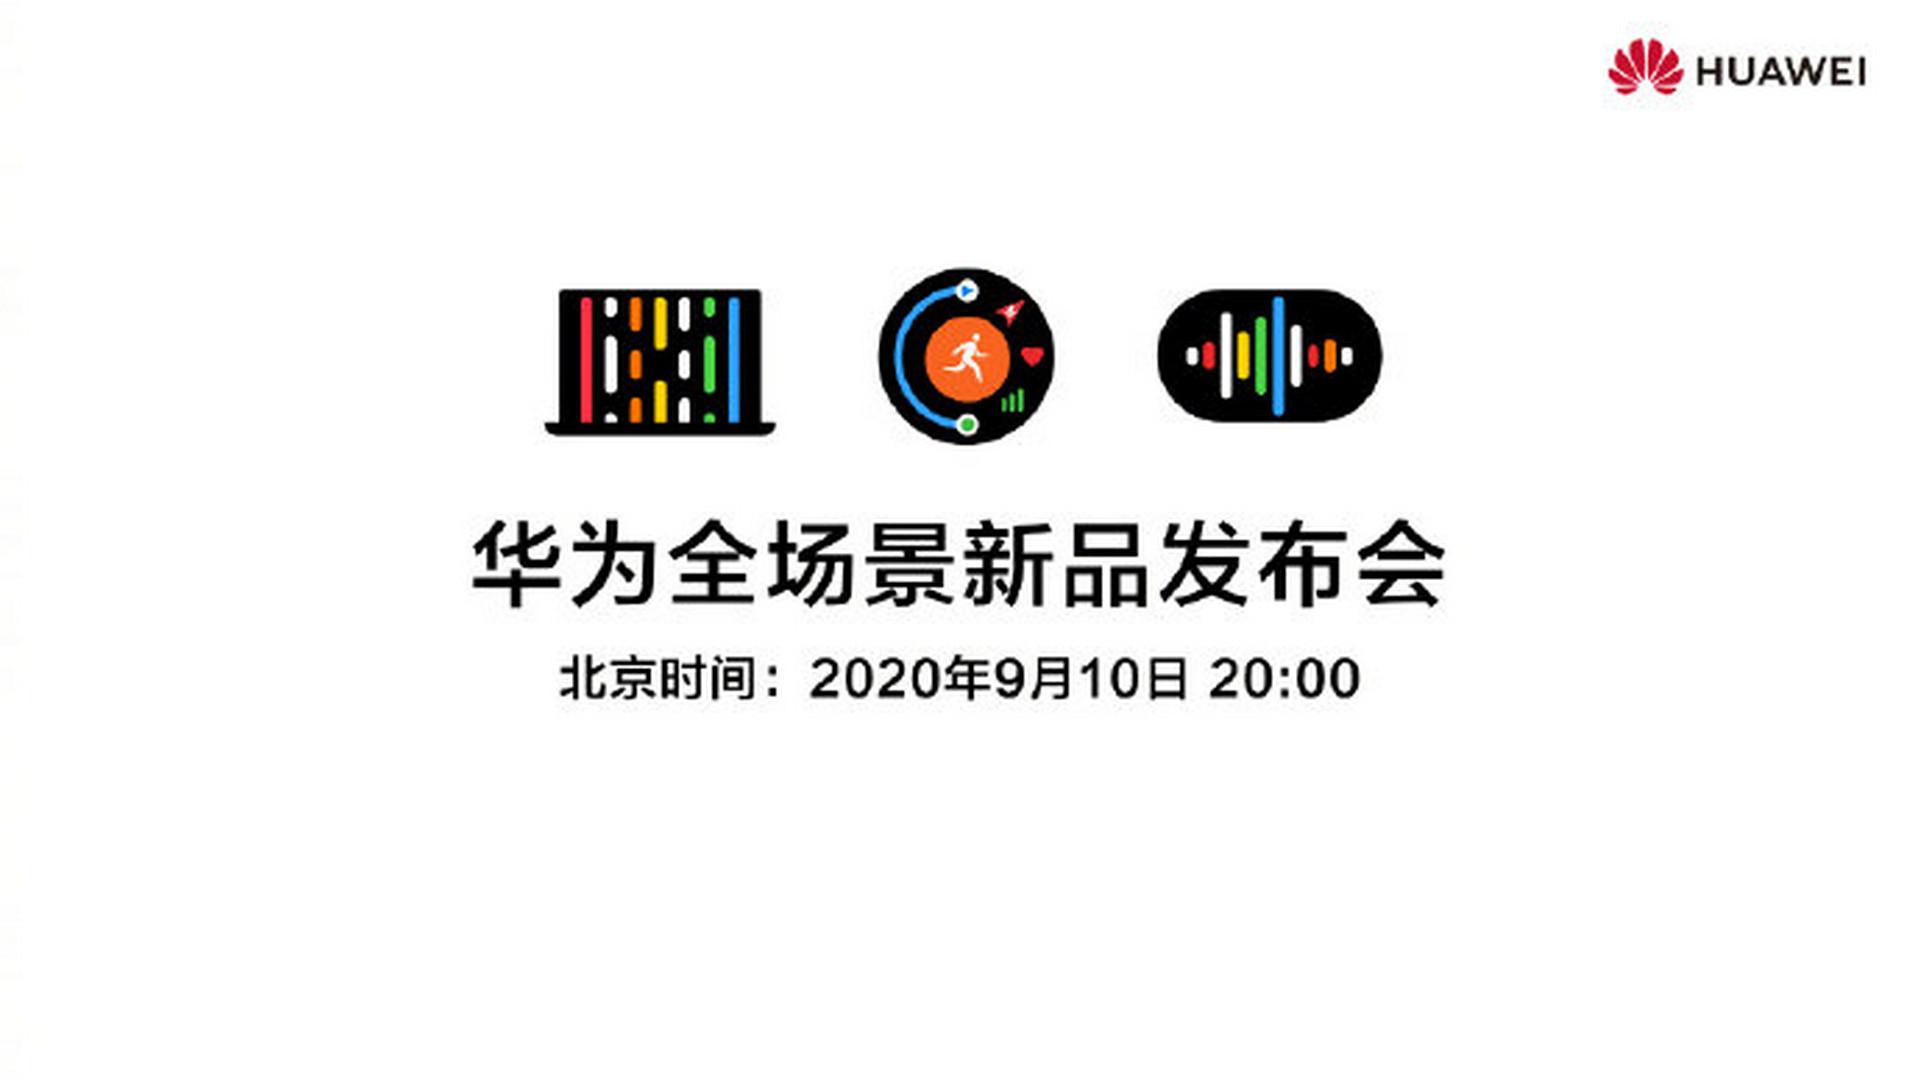 huawei harmonyos 2.0 data presentazione hdc 2020 5